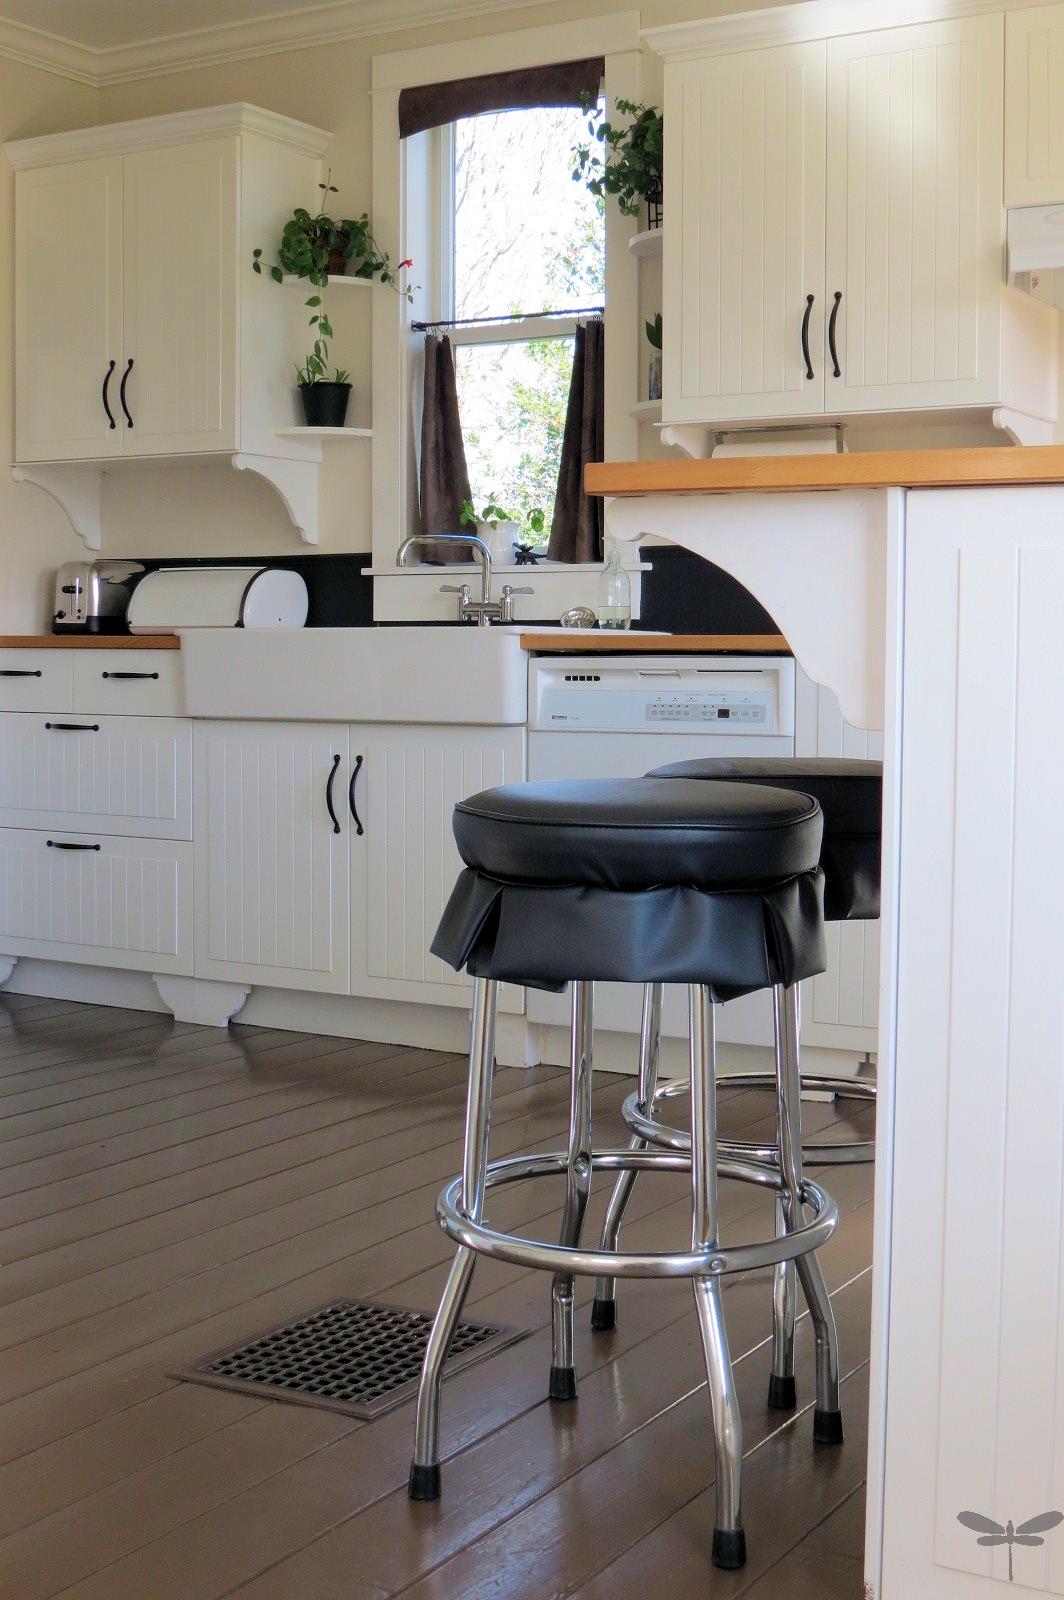 Inspire Me Heather: DIY kitchen cabinet corbels | Home | Pinterest ...